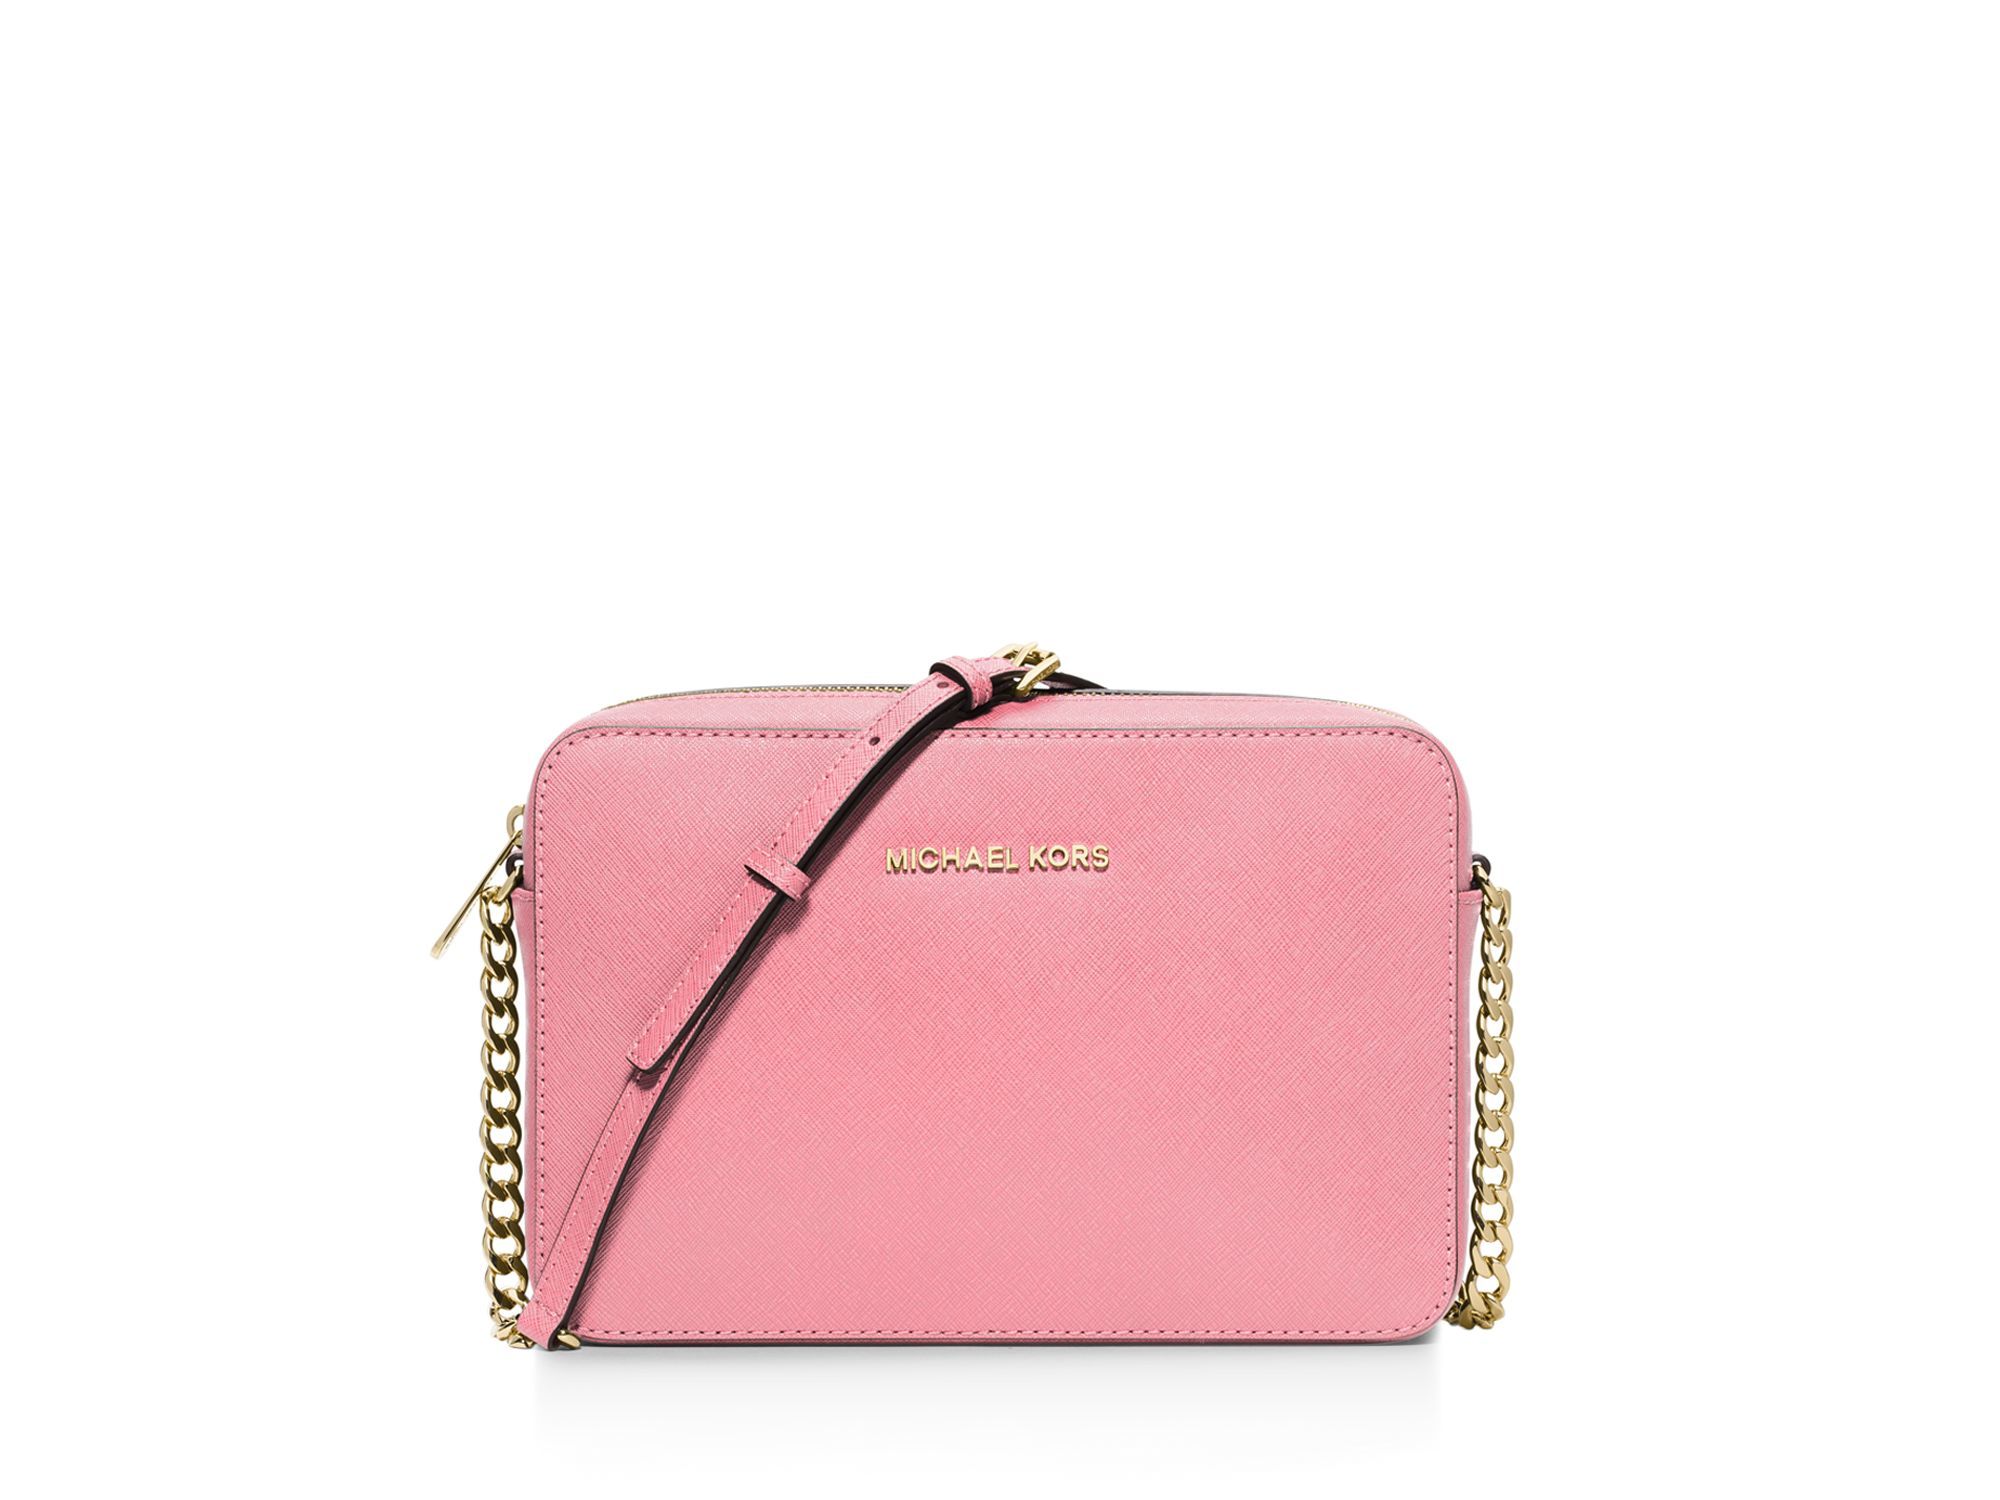 0132a2b477b2 ... SALE Michael Kors Leather Handbag Gallery ...